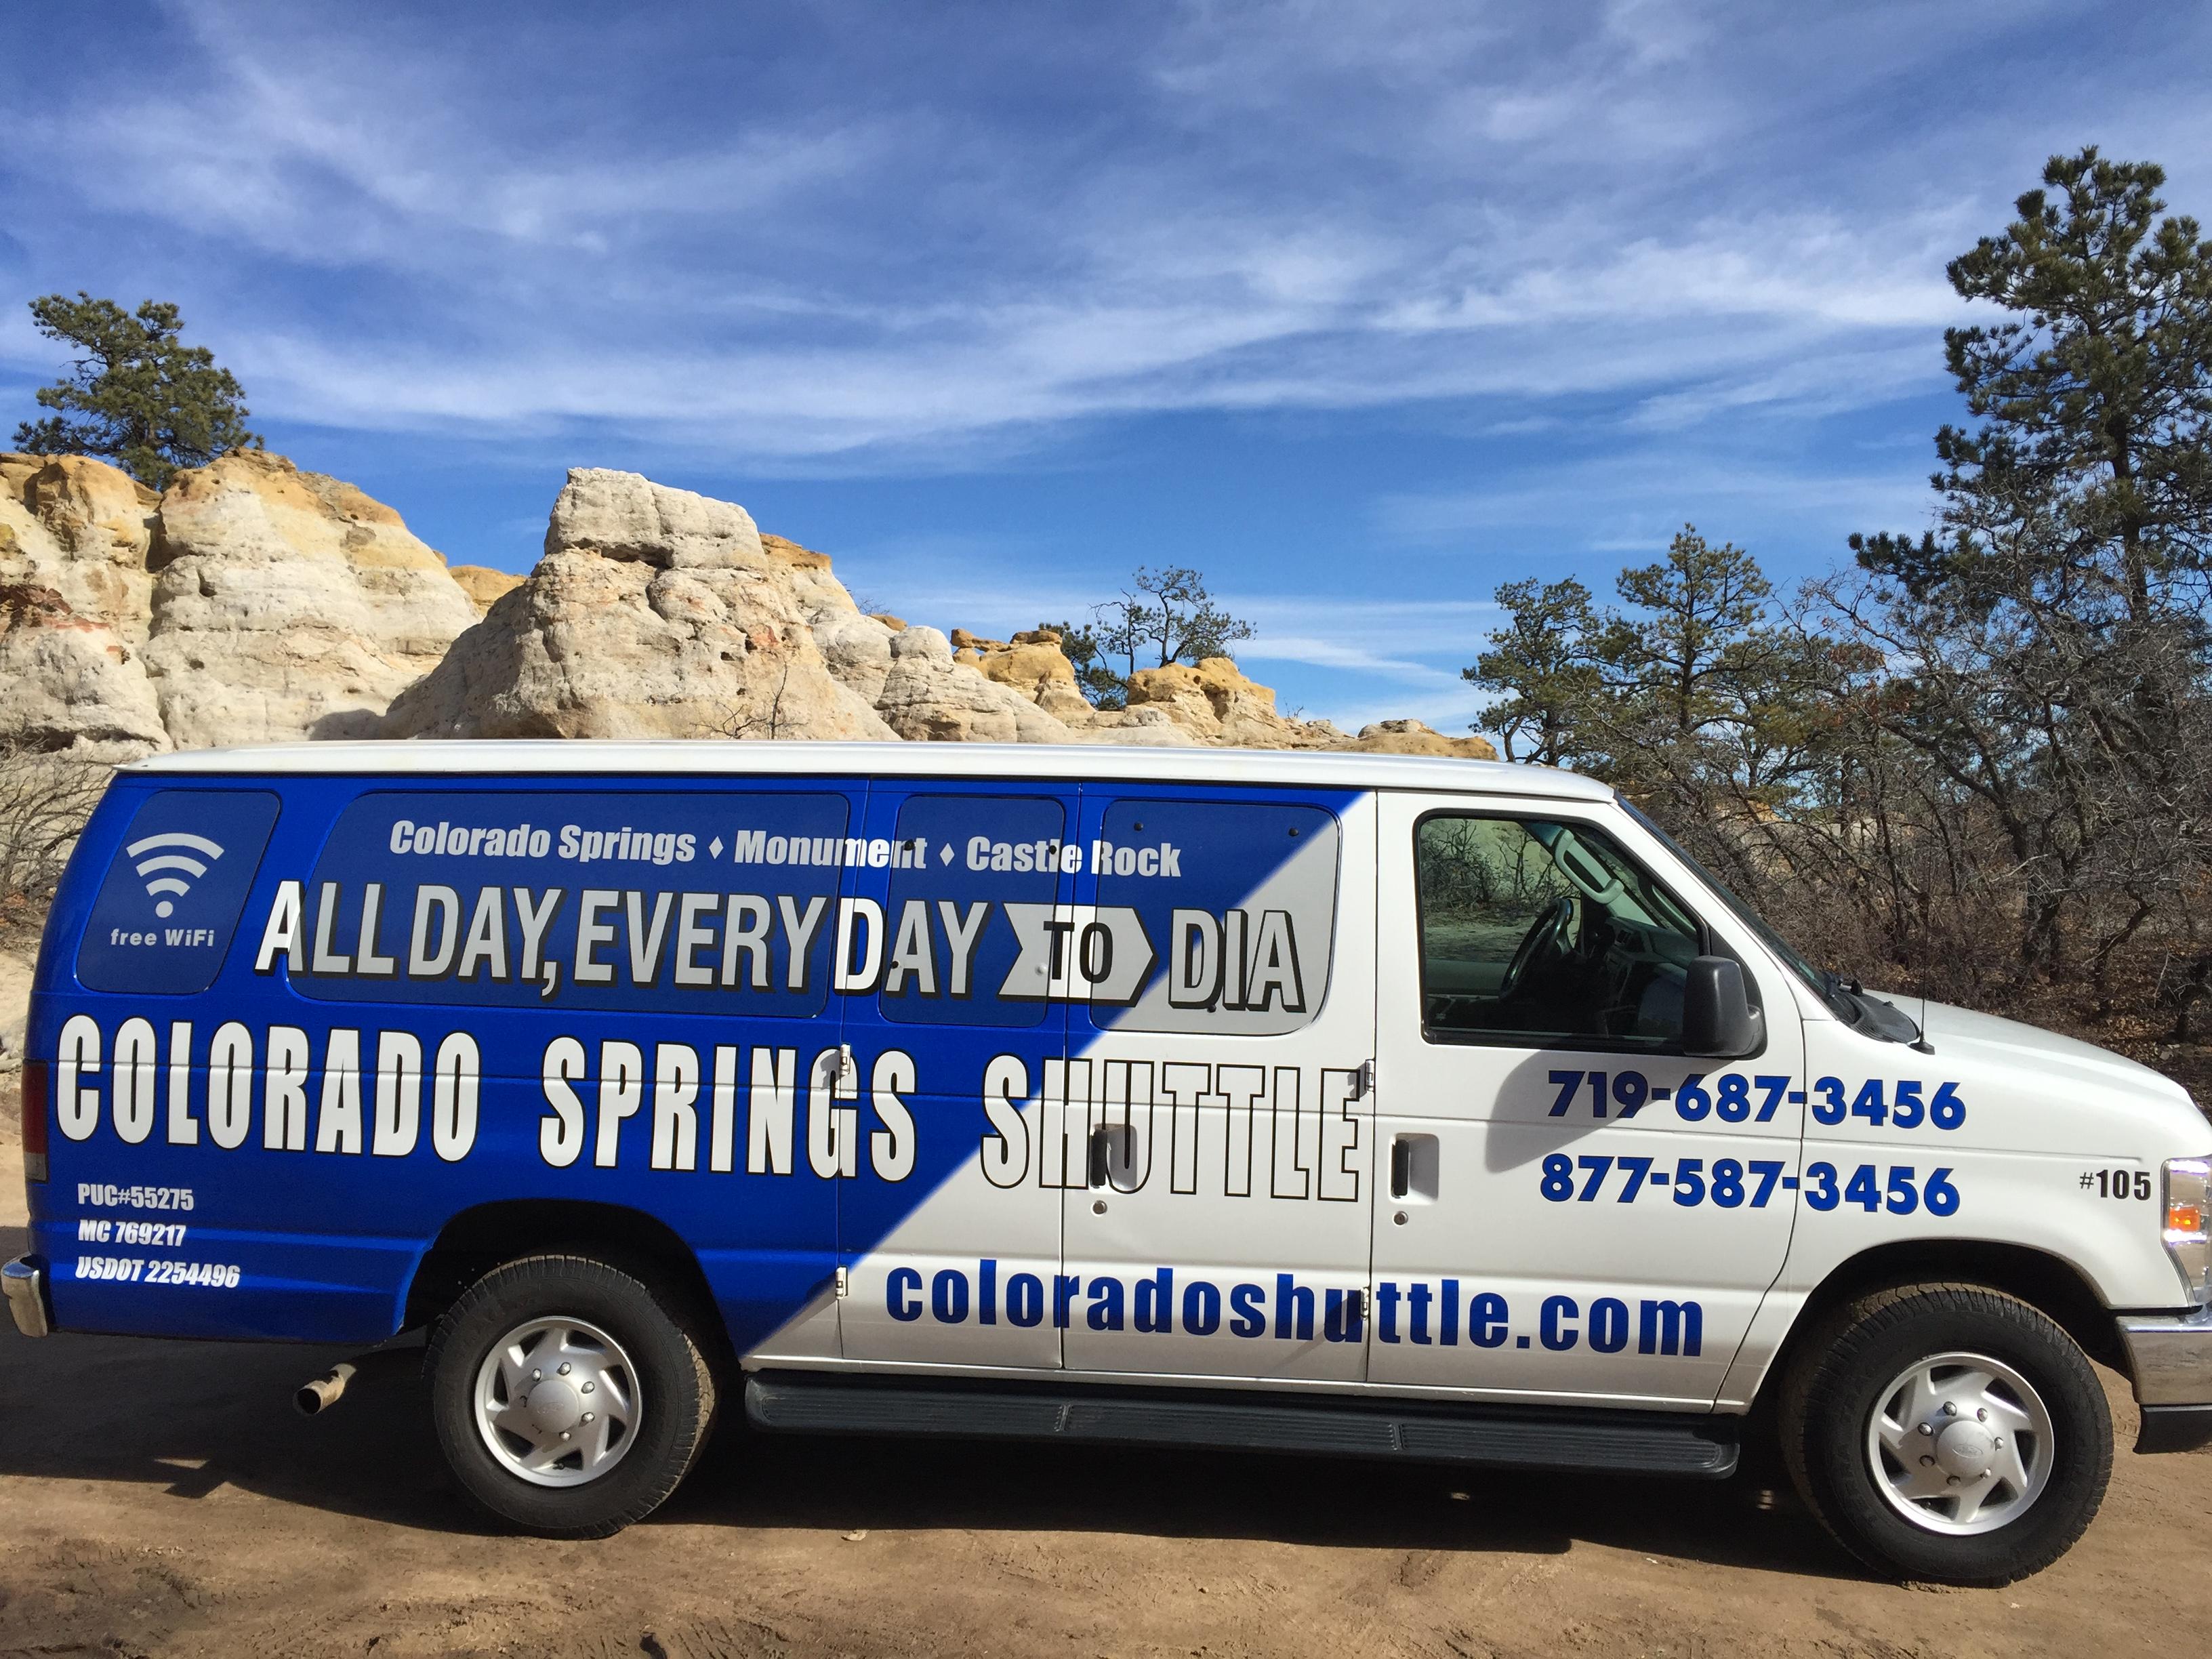 Colorado Springs Shuttle Colorado Springs Colorado Co